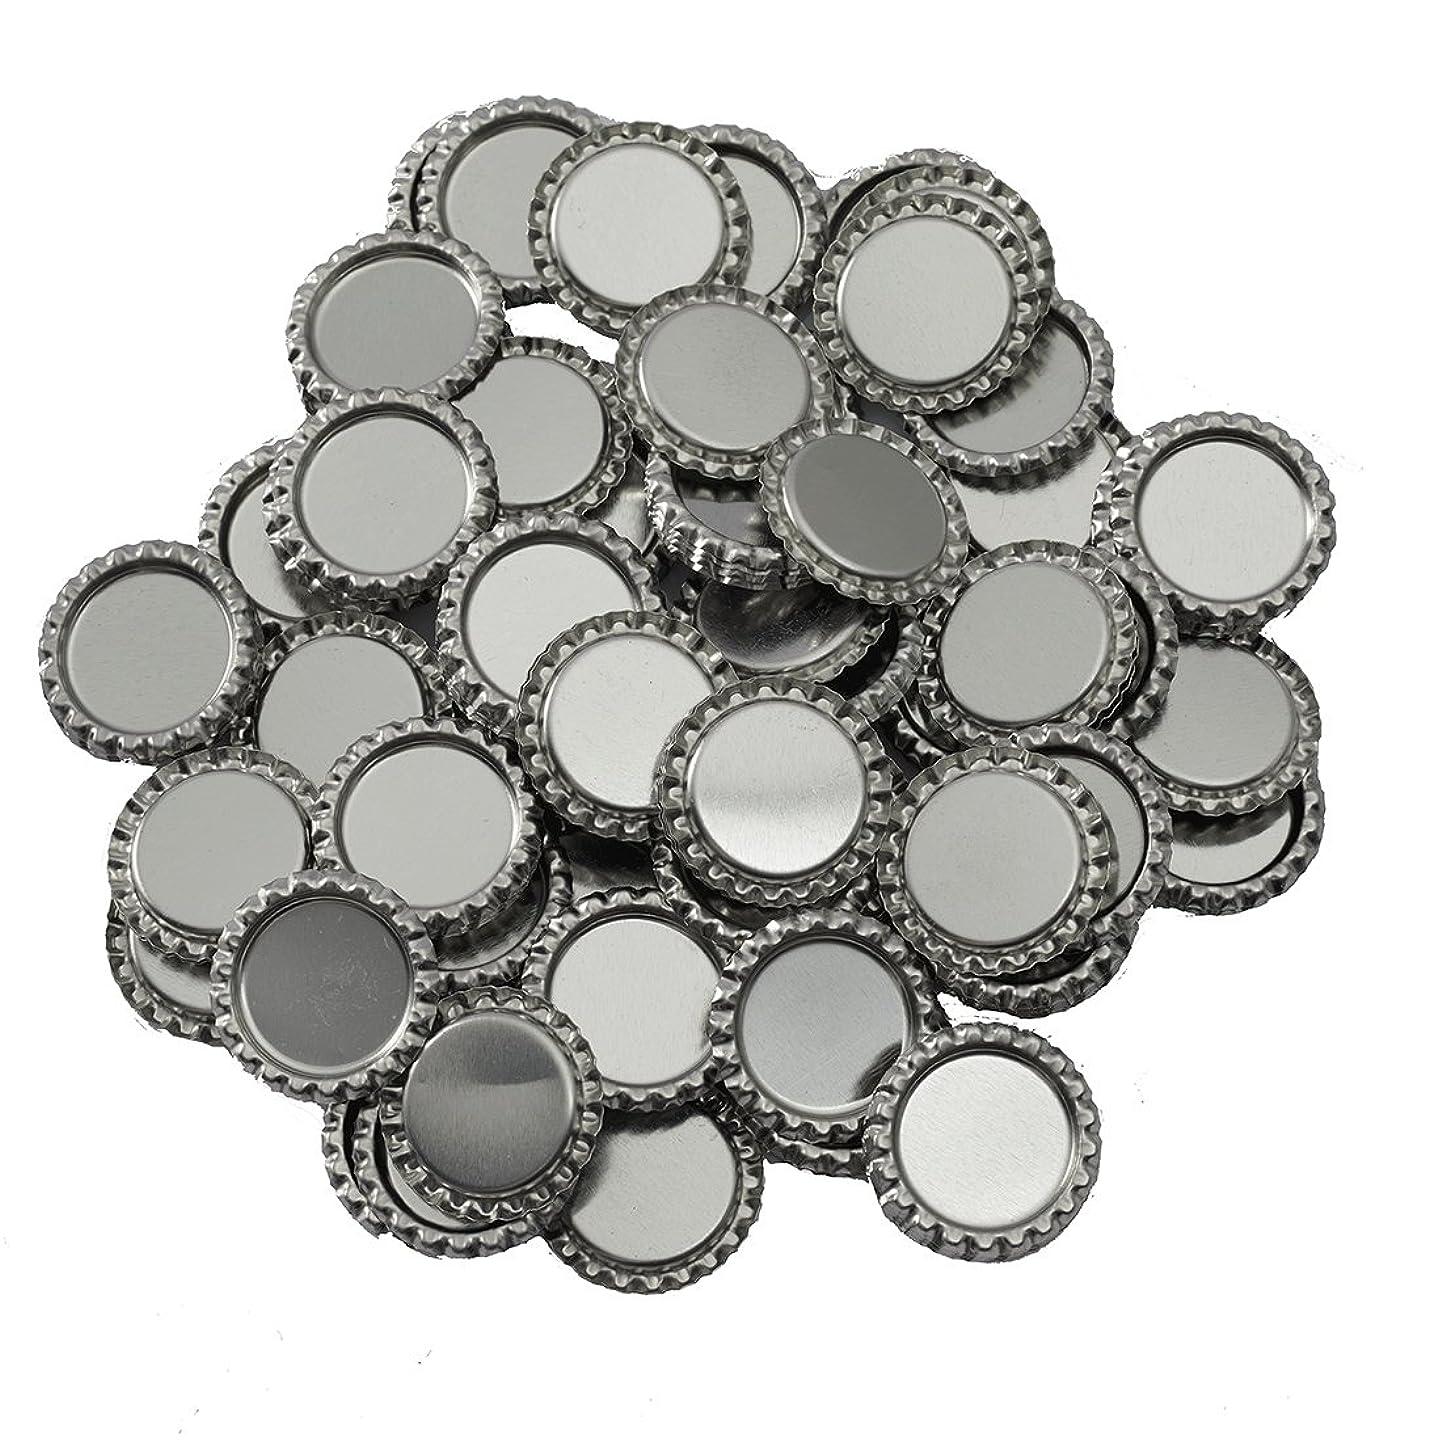 IGOGO 200 PCS Silver Chrome Bottle Caps for Hair Bows, DIY Pendants or Craft Scrapbooks neatgwnyect4